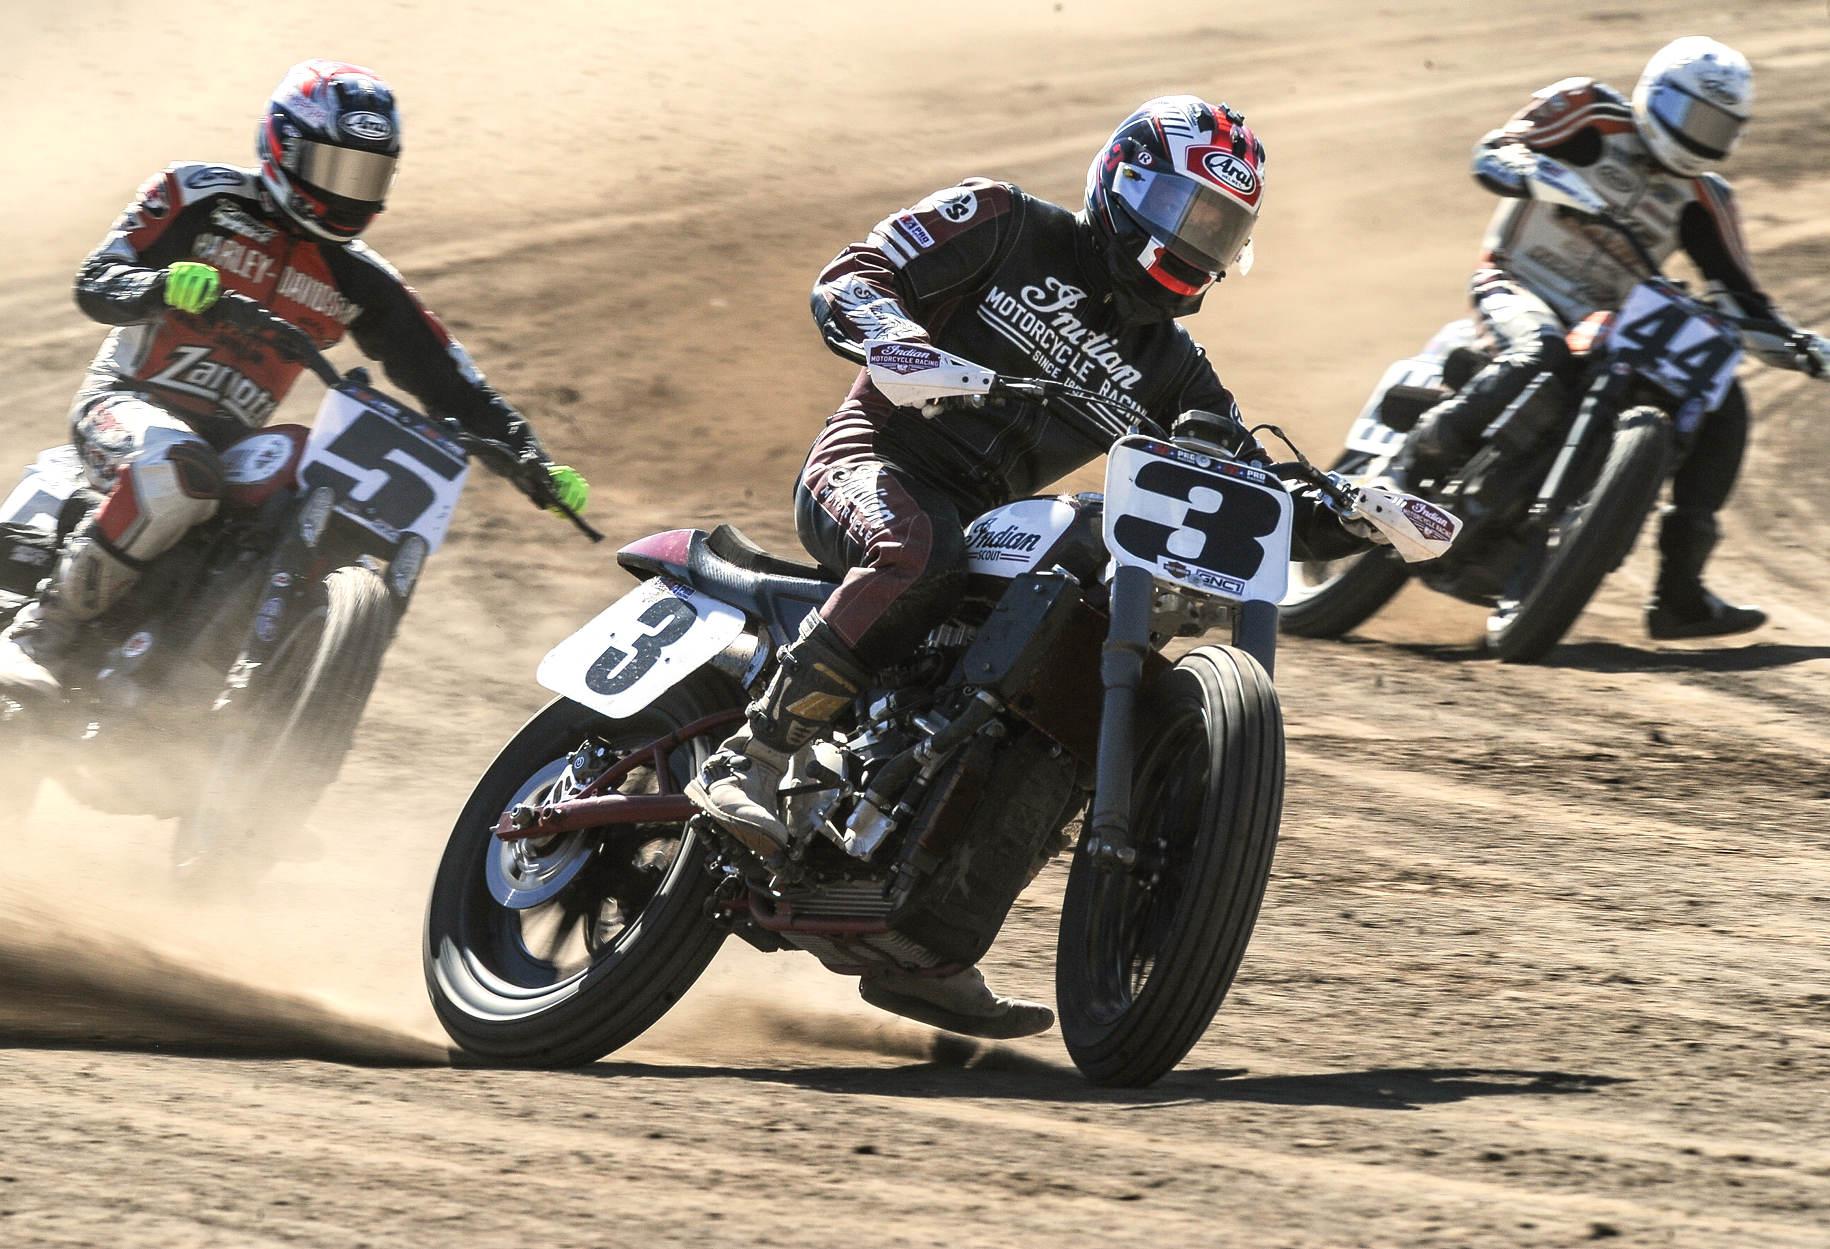 fist motorcycle race